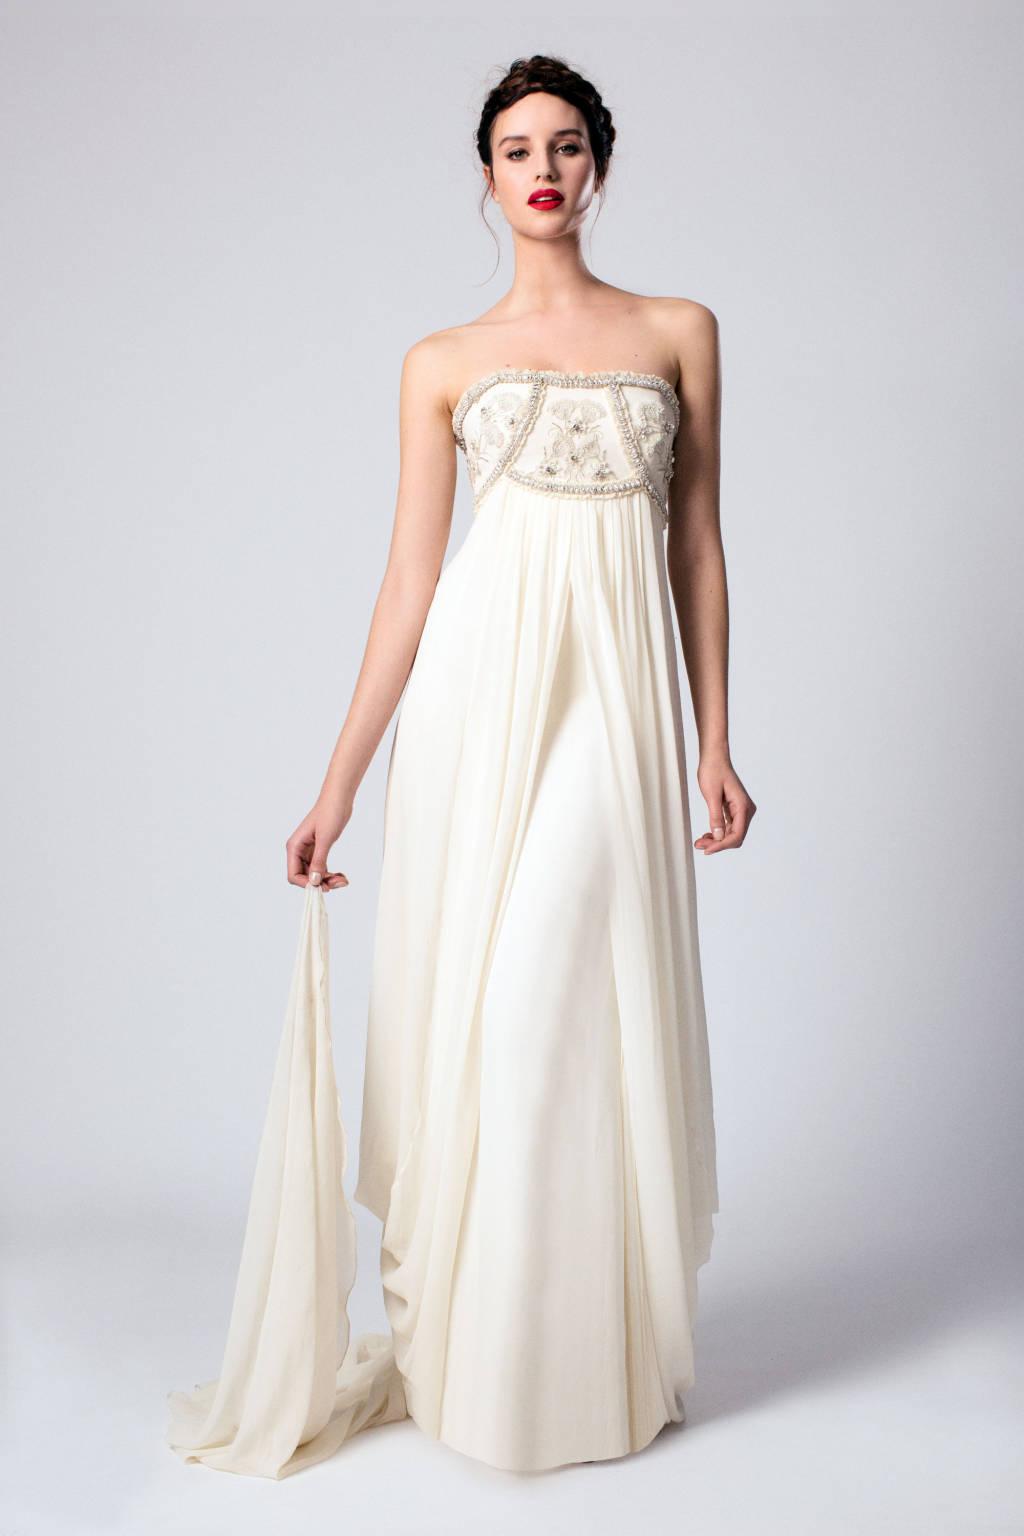 monique lhuillier j mendel wedding dress hbz temperley CRYSTAL MIRAGE DRESS lg